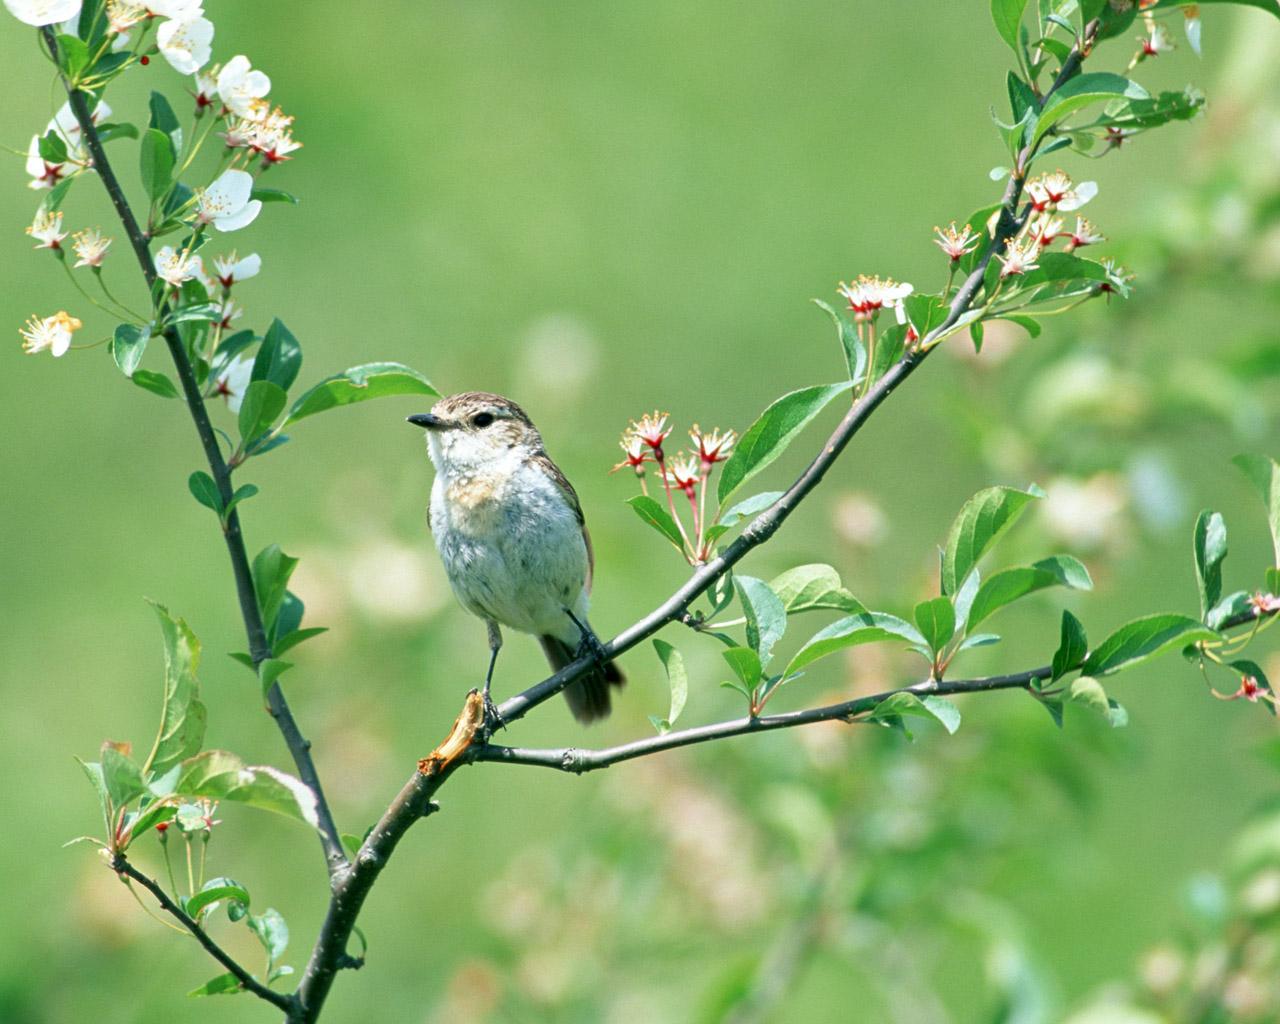 spring bird on a - photo #10